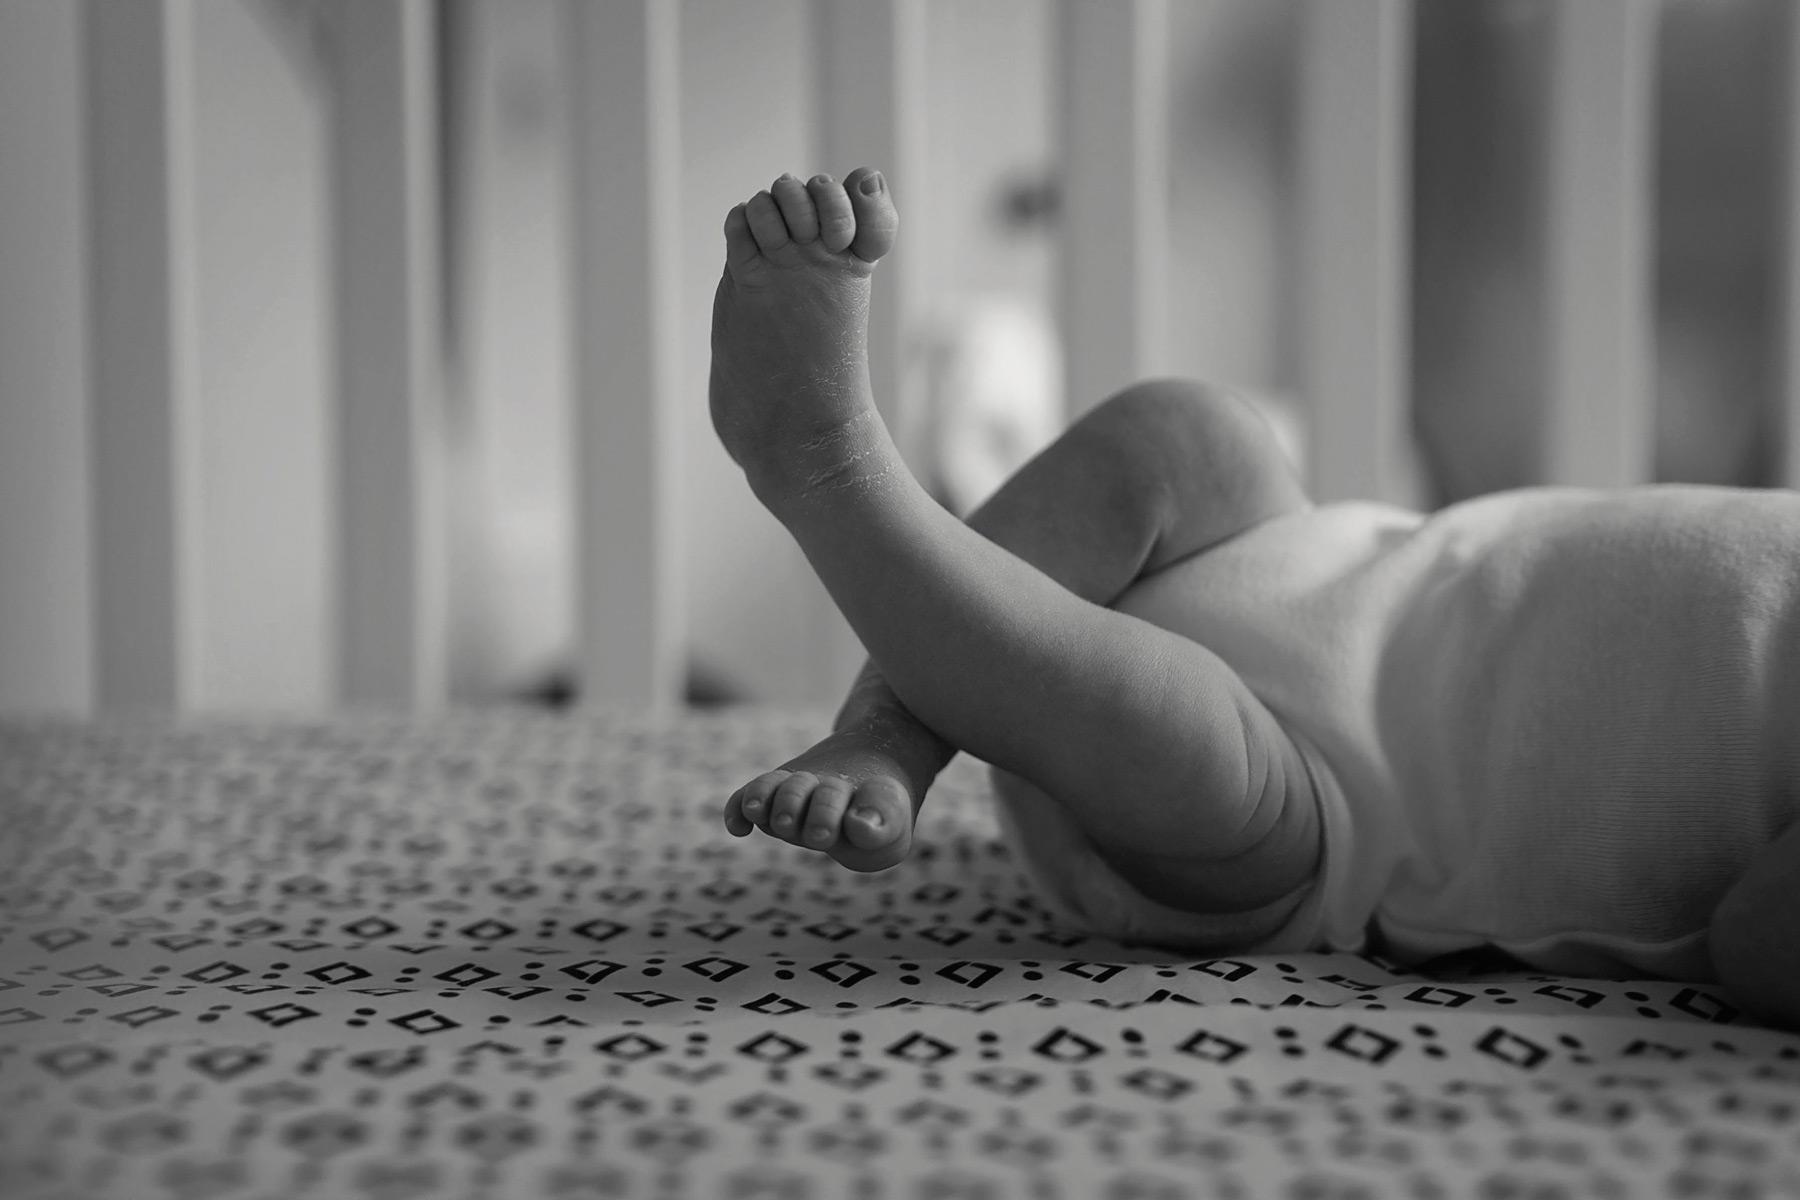 newborn_toes_in_crib.jpg